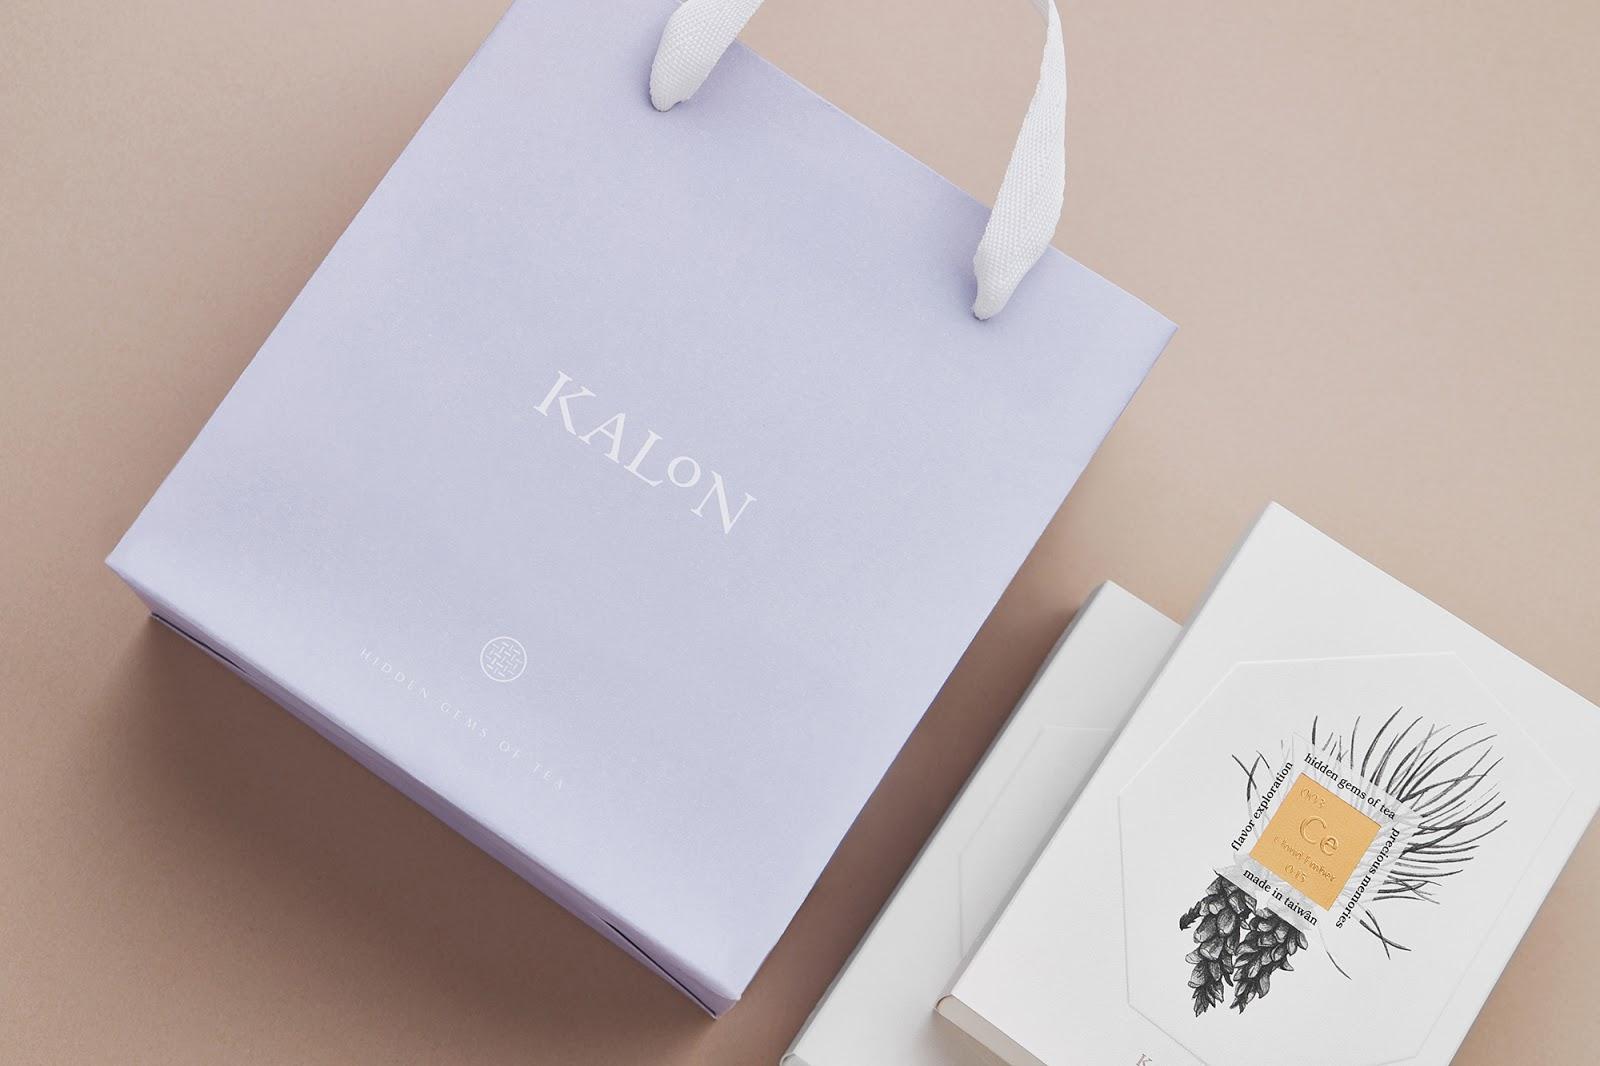 Kalon Tea 欧风花茶手提袋